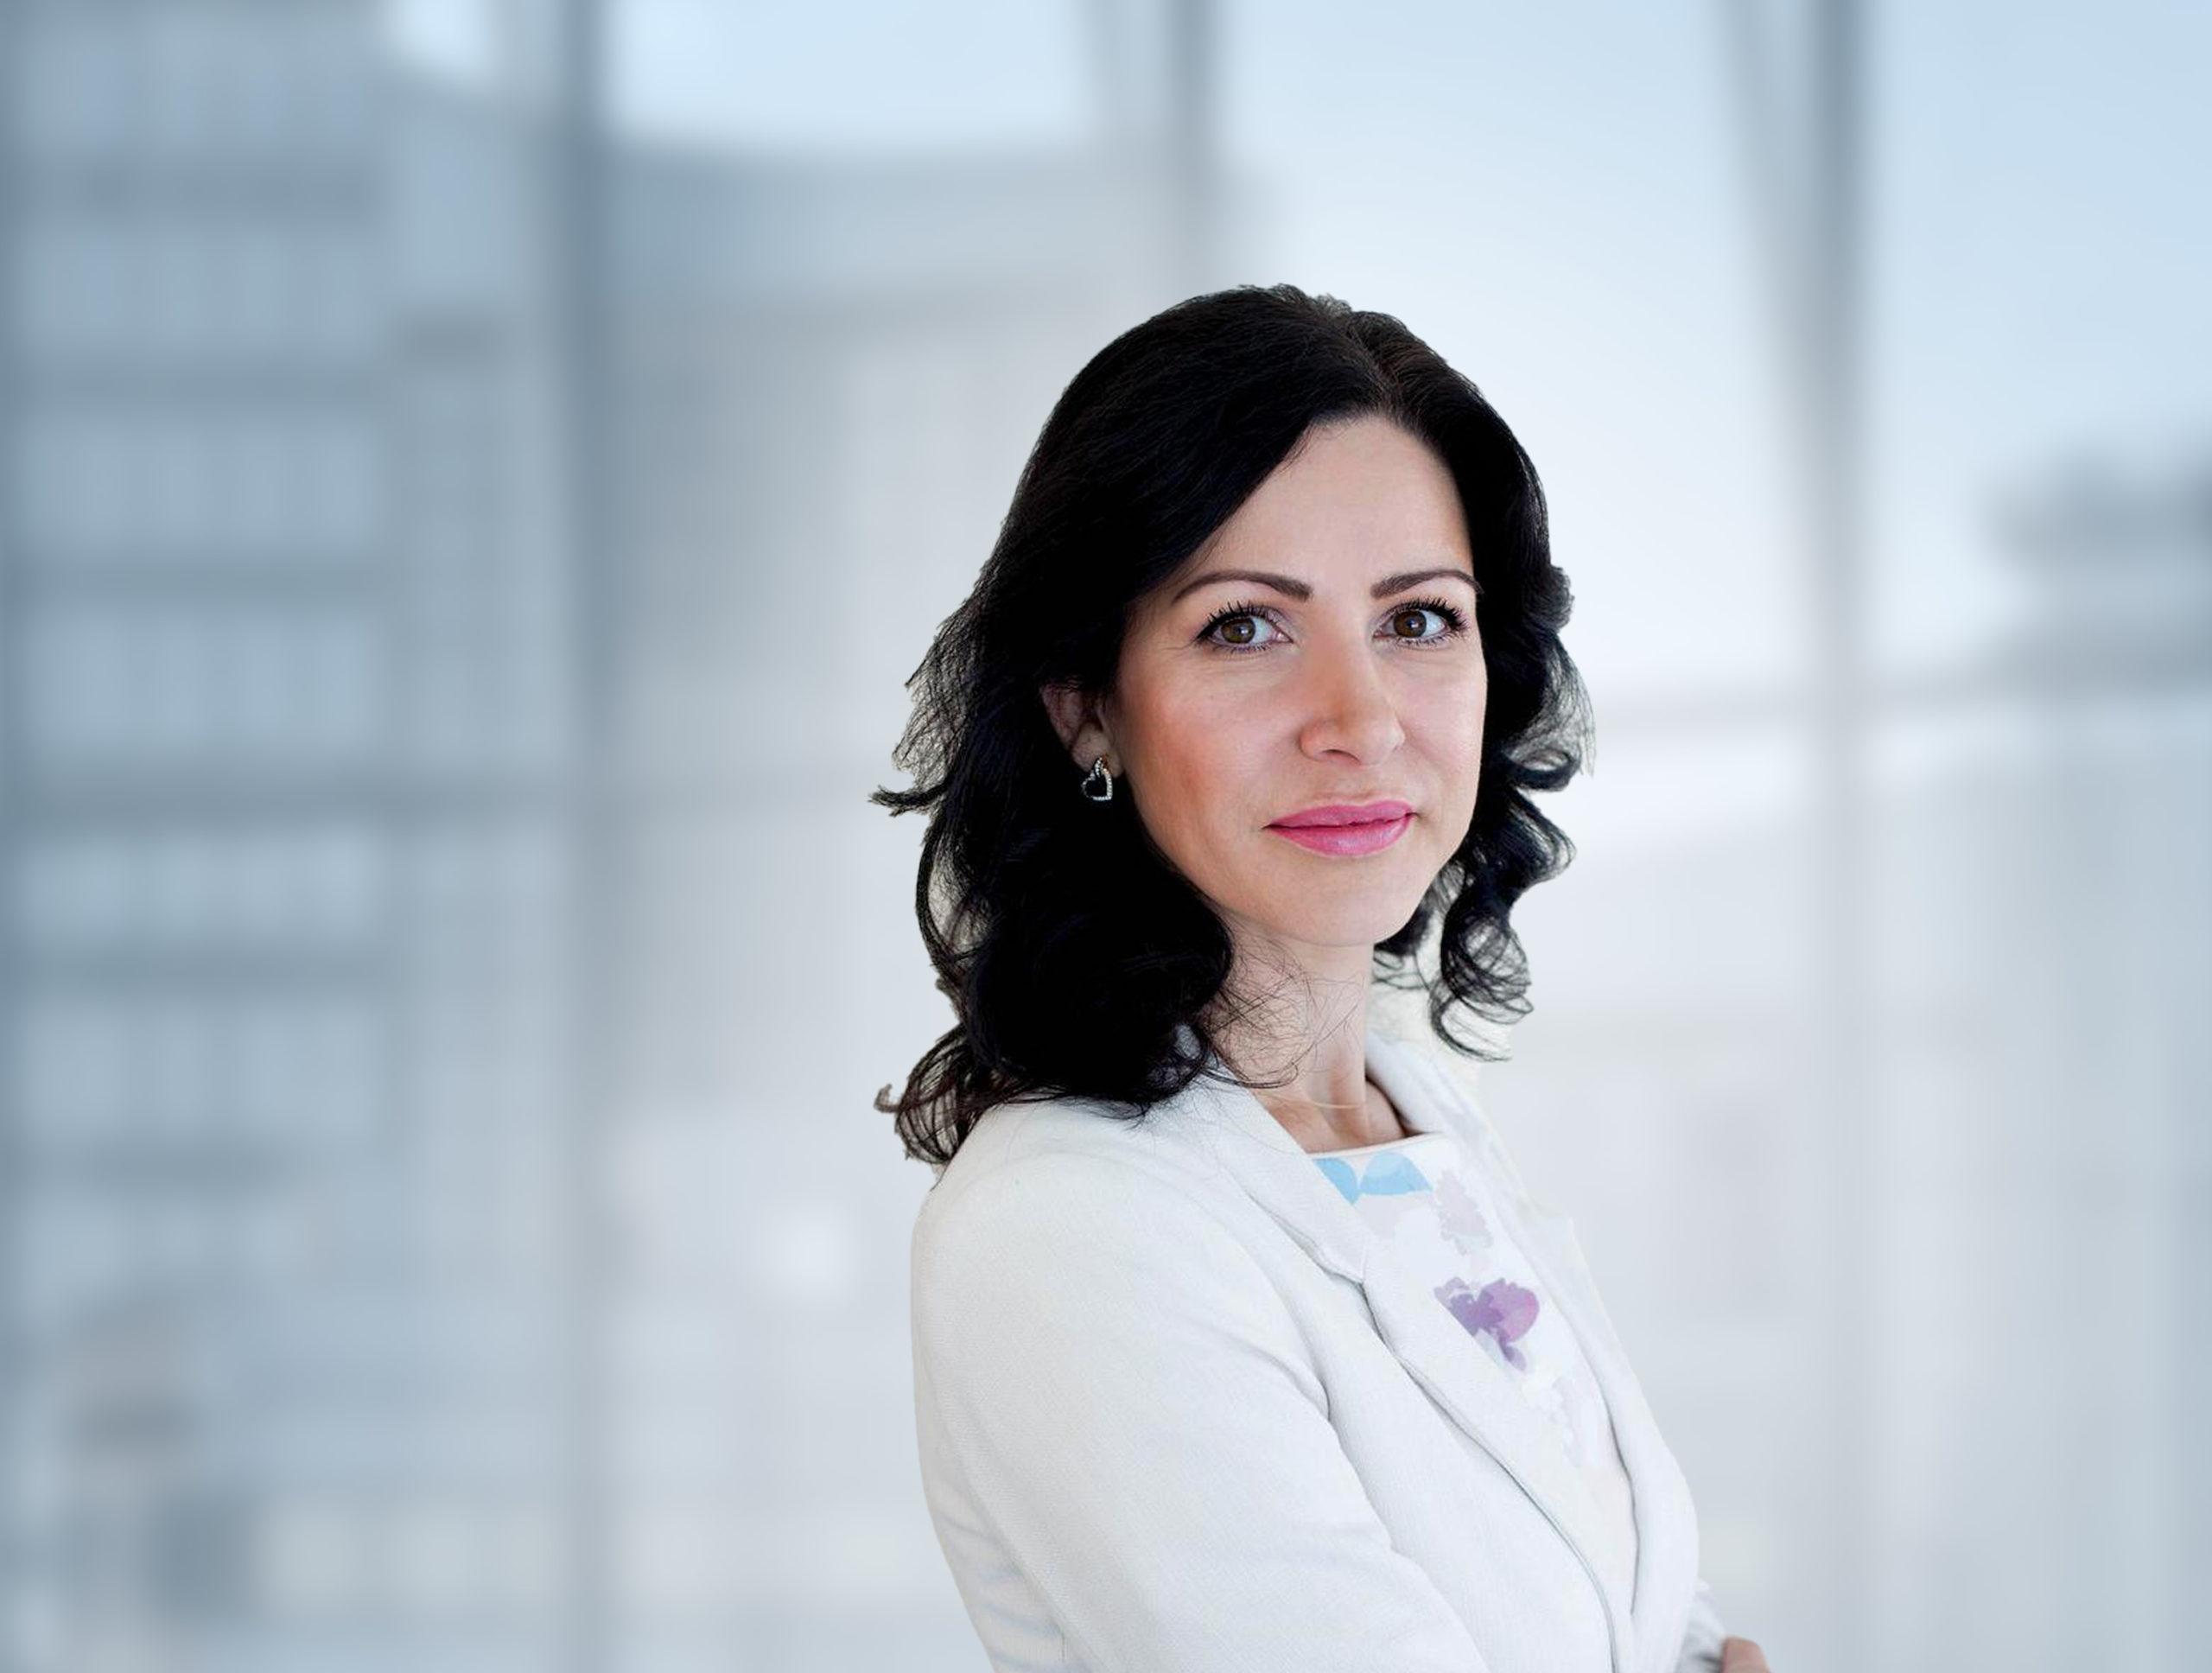 Ivana Riegler